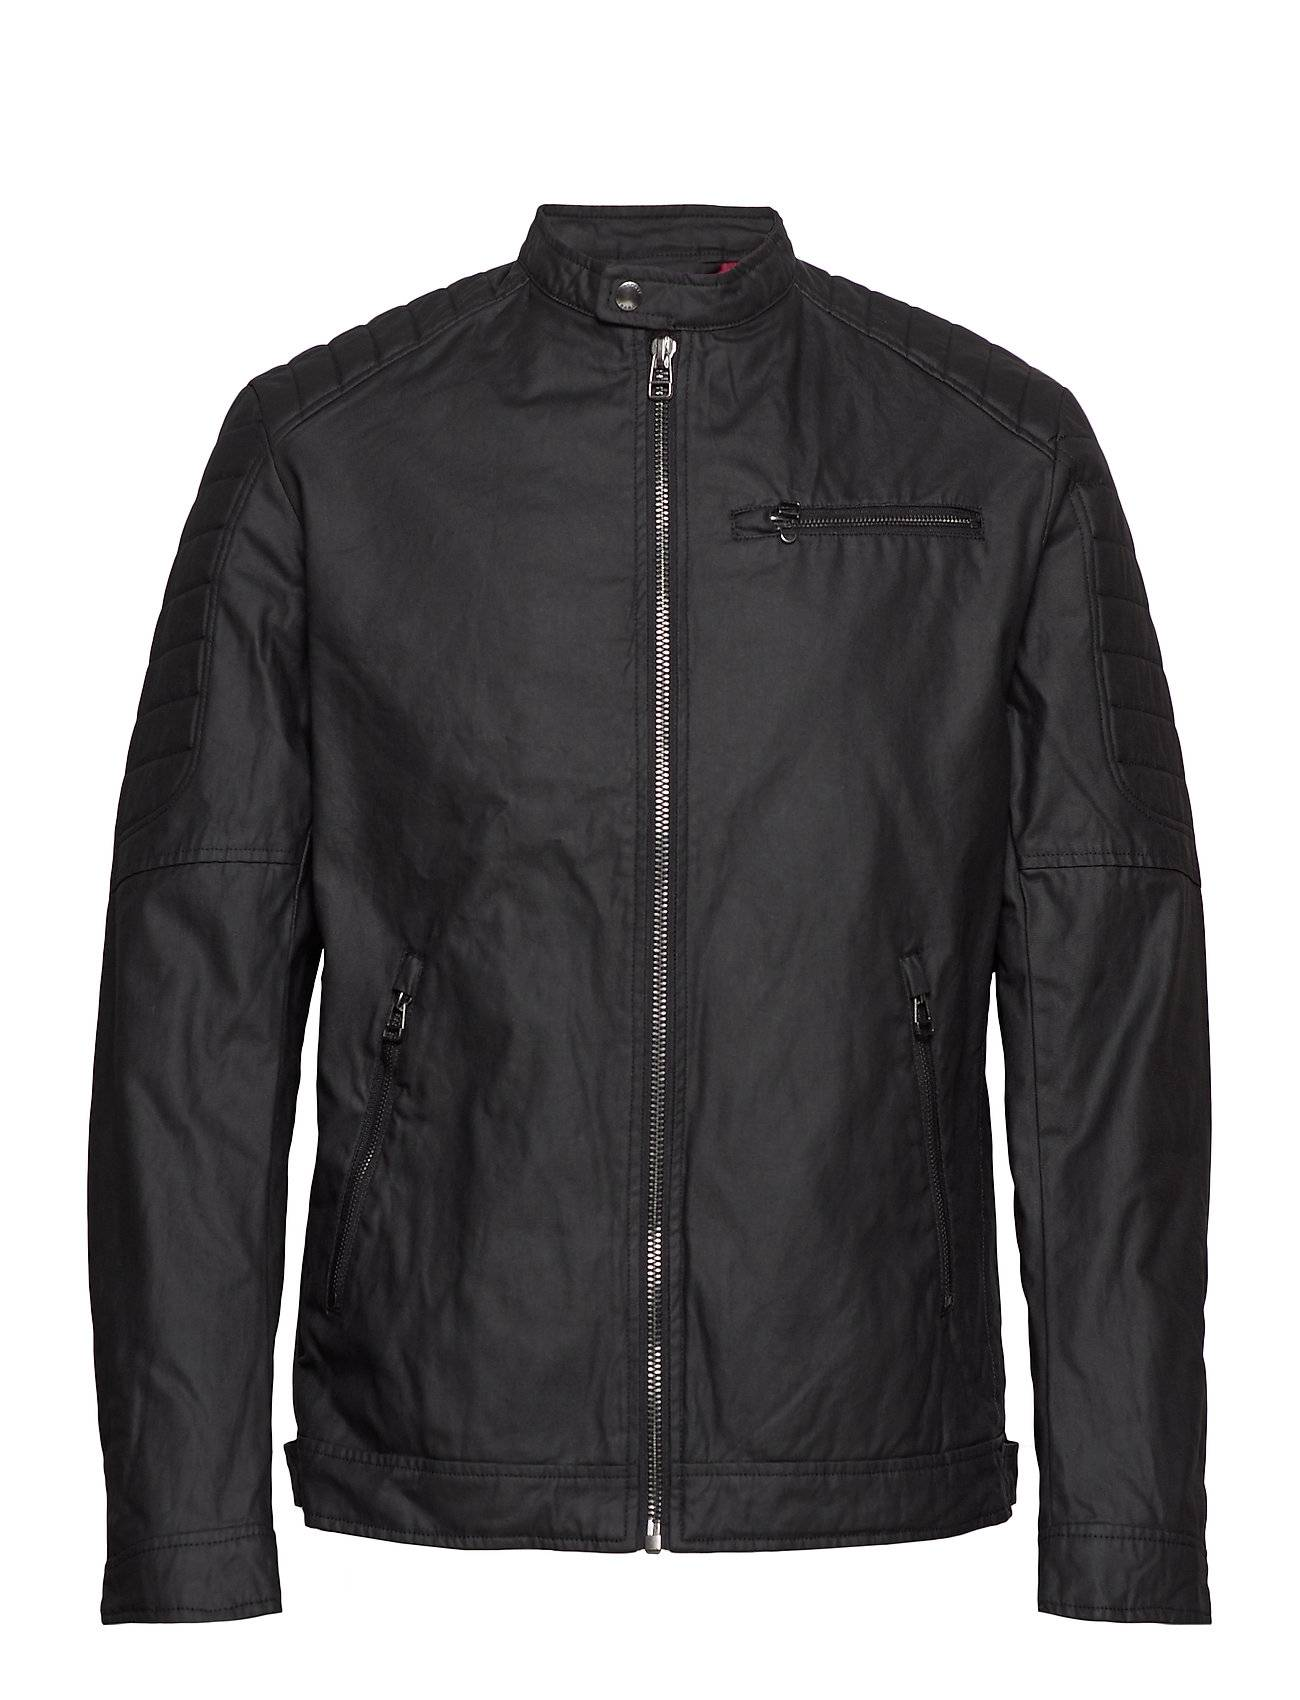 Image of Esprit Casual Jackets Outdoor Woven Nahkatakki Musta Esprit Casual